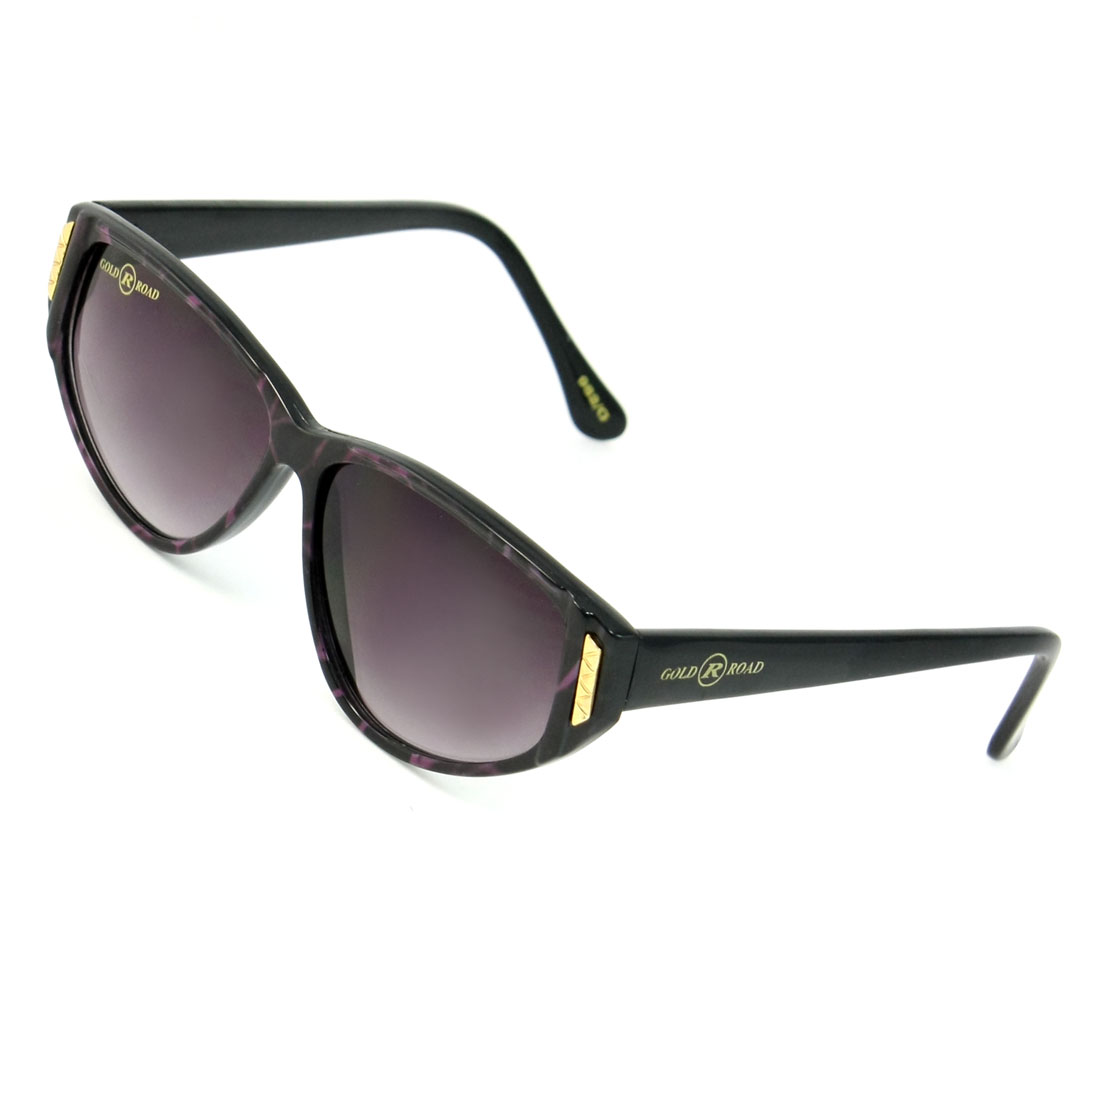 Clear Gray Teardrop Lens Metal Decor Plastic Full Rim Sunglasses Glasses for Ladies